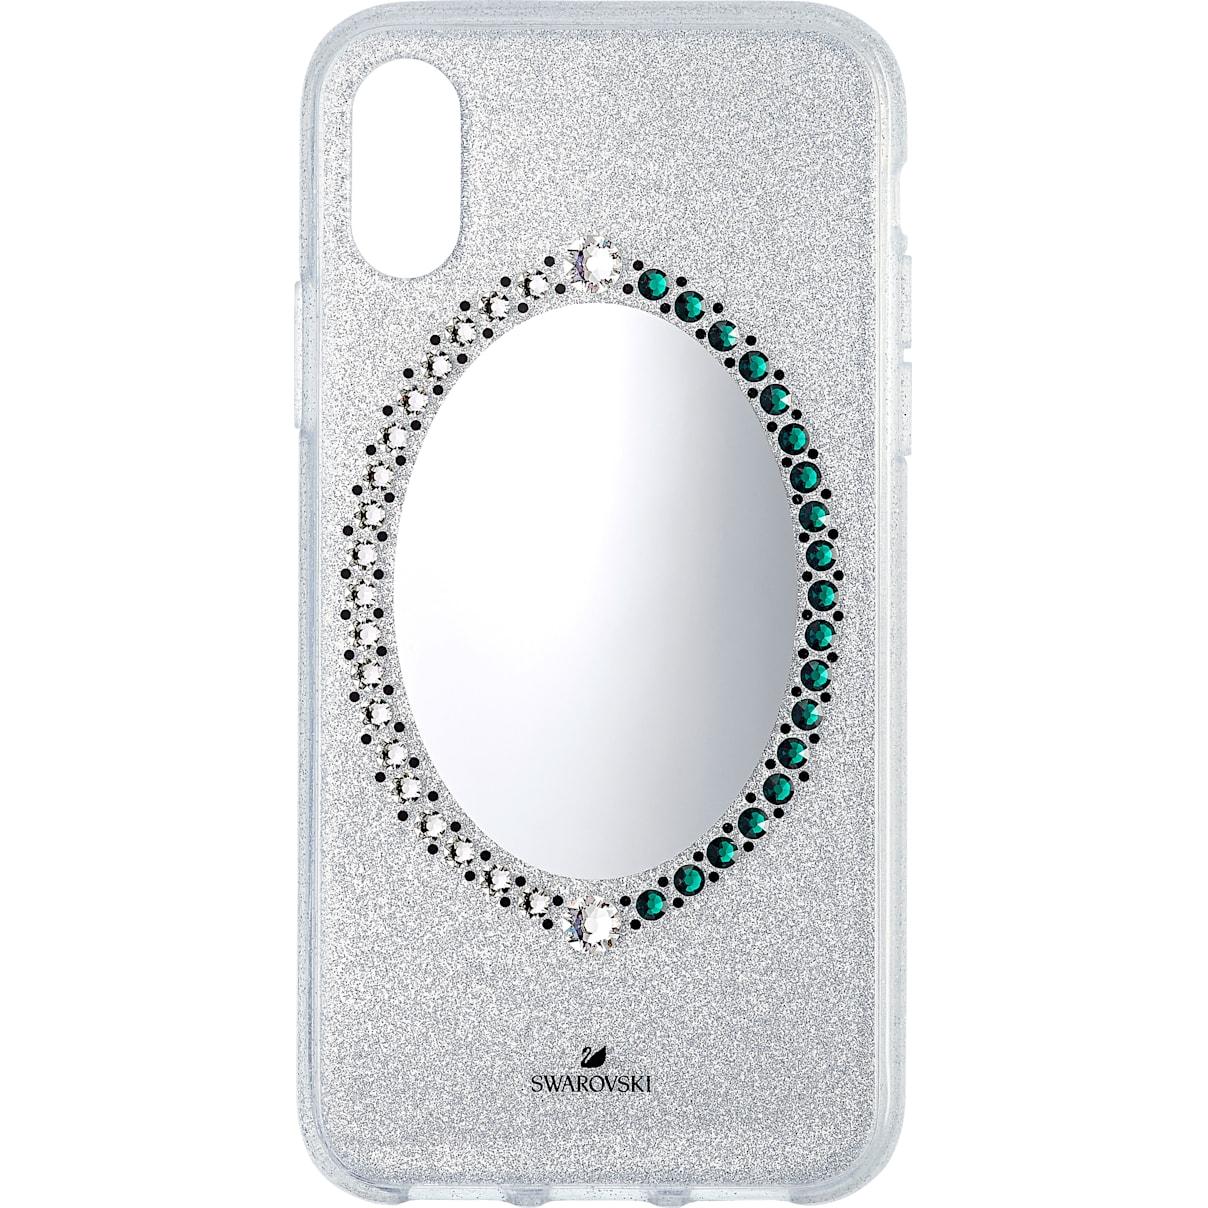 Swarovski Black Baroque Smartphone Case, iPhone® X/XS, Gray